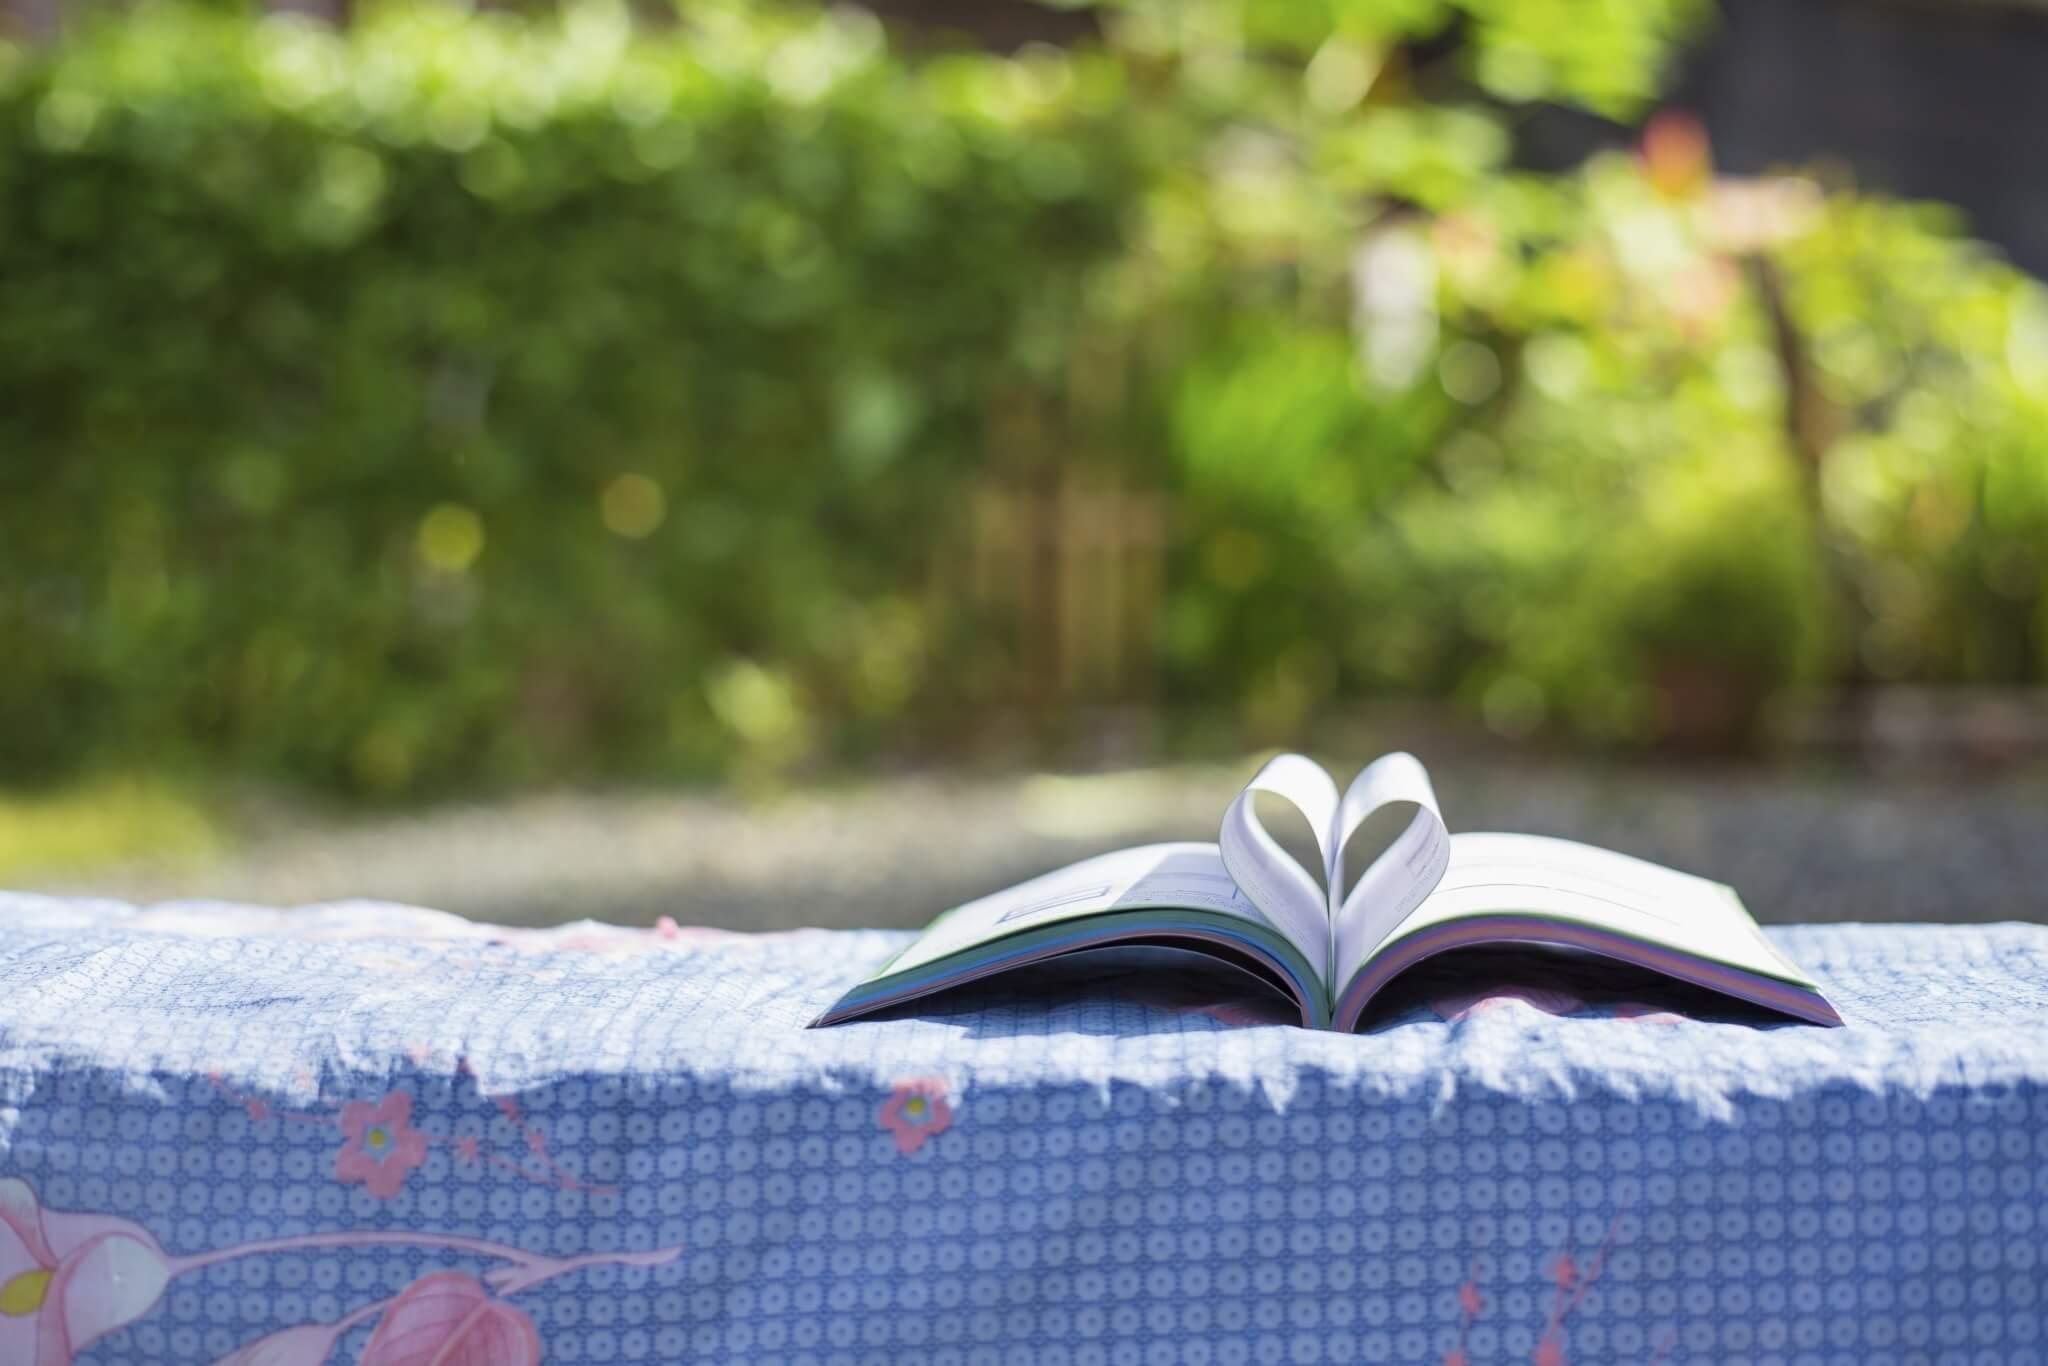 Book-of-love-in-the-garden-000066664581_Double.jpg.jpeg